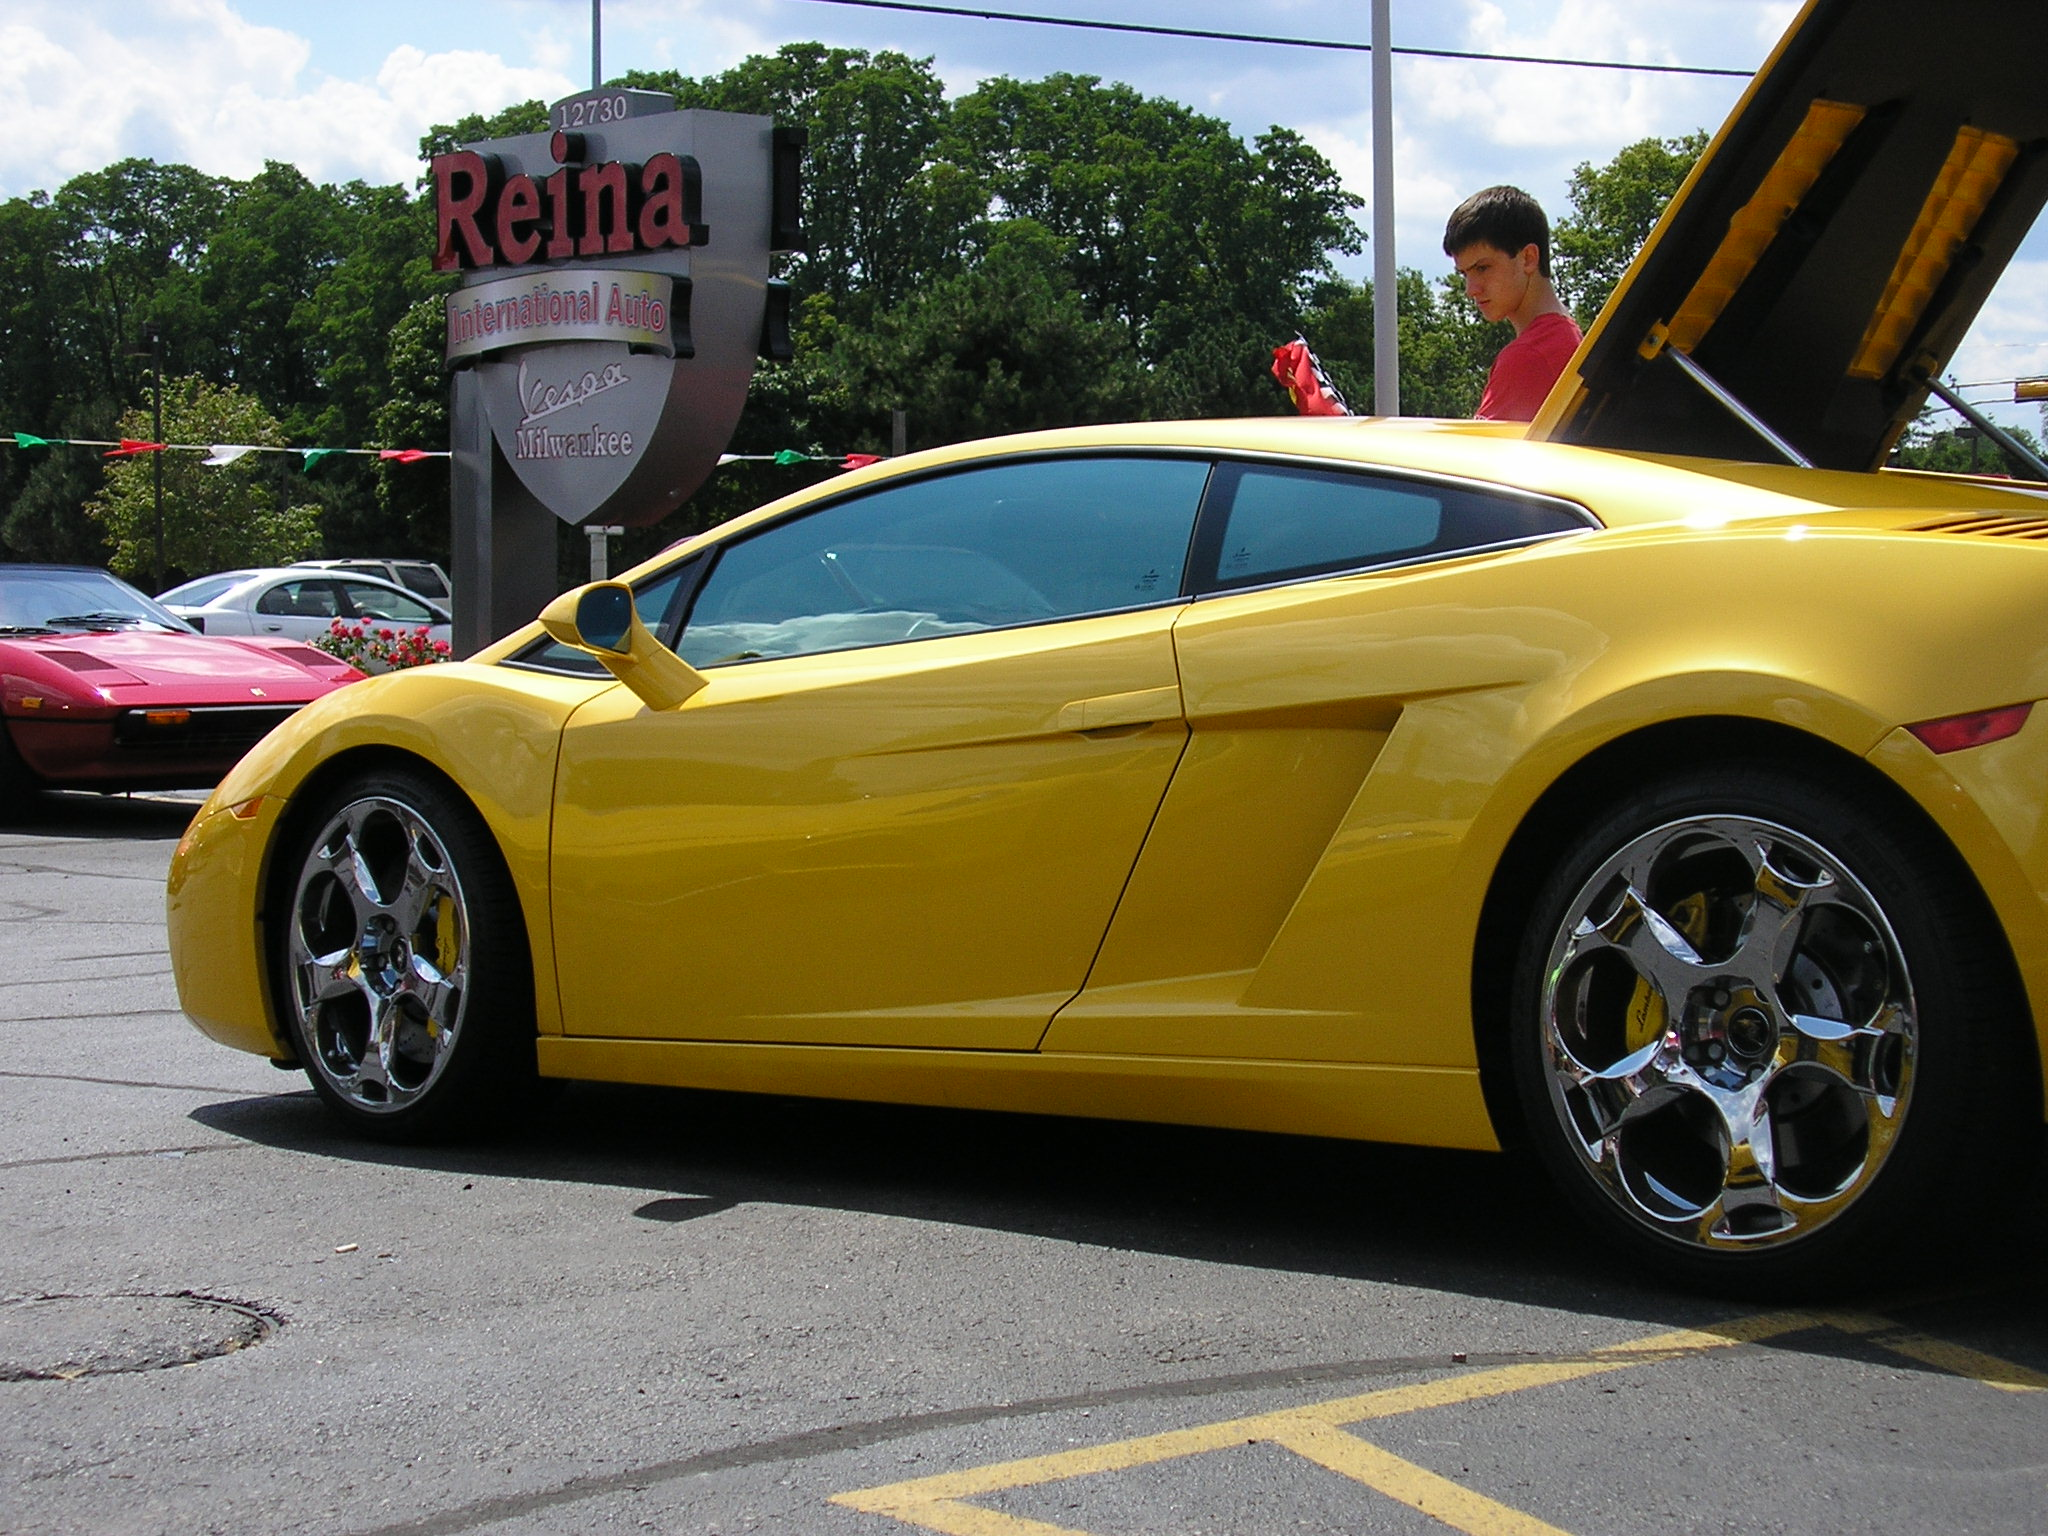 Reina International Auto Exotic Sports Cars And Vespa